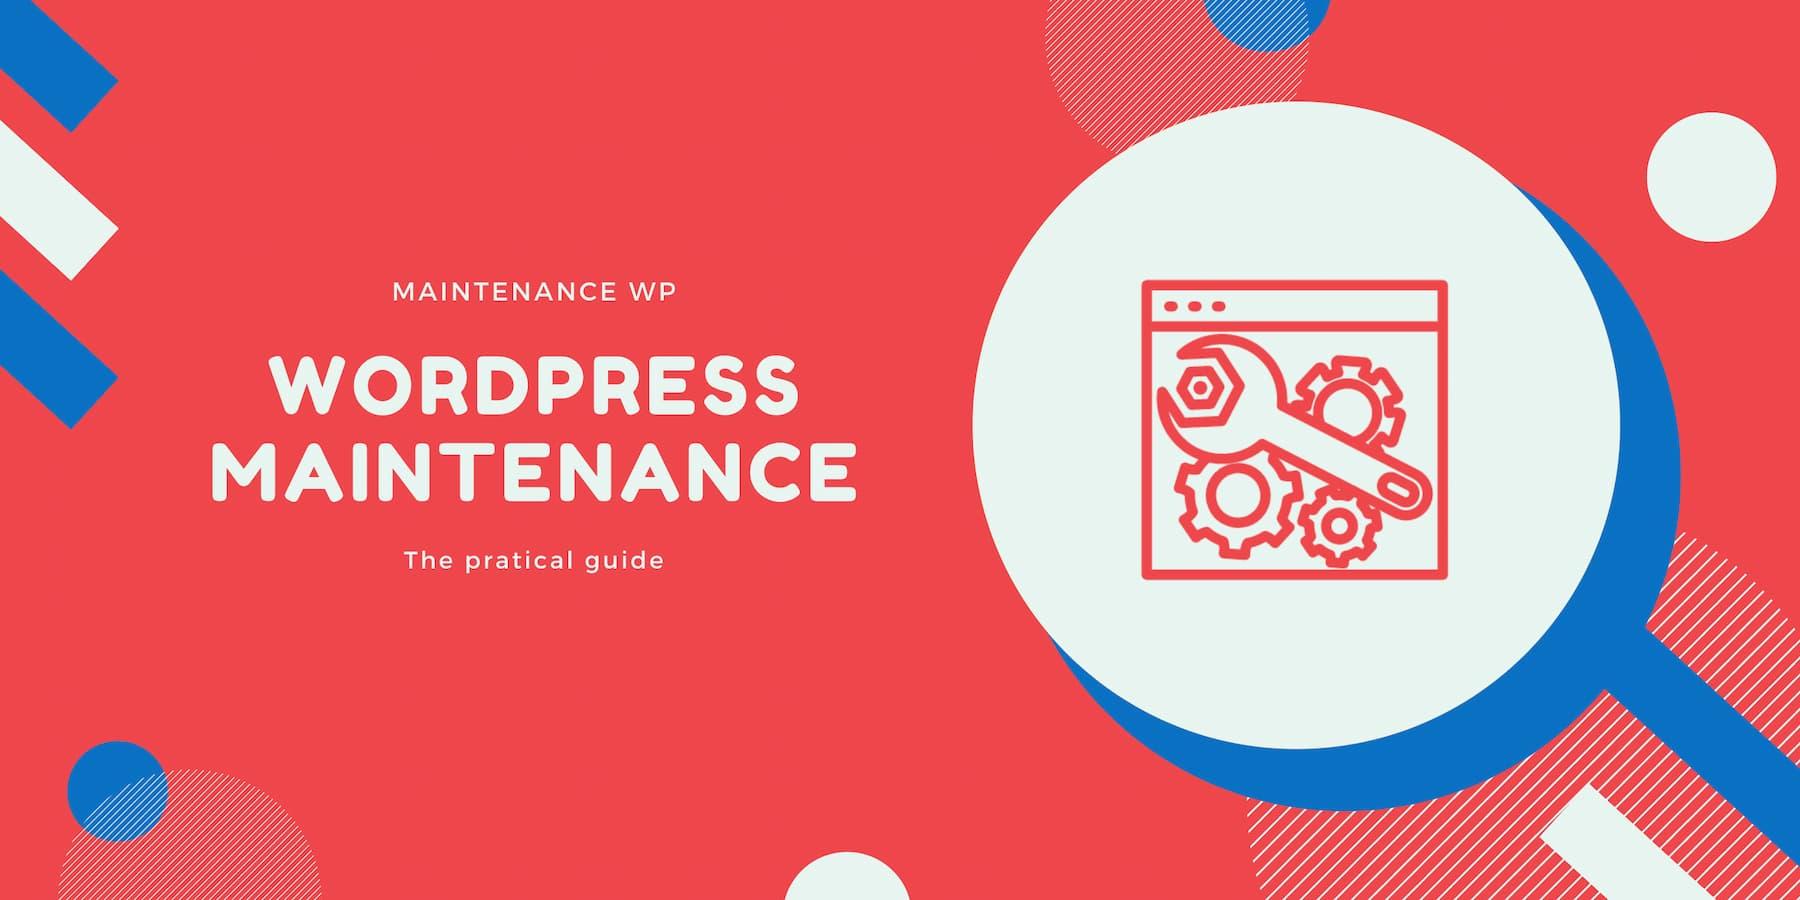 WordPress maintenance guide